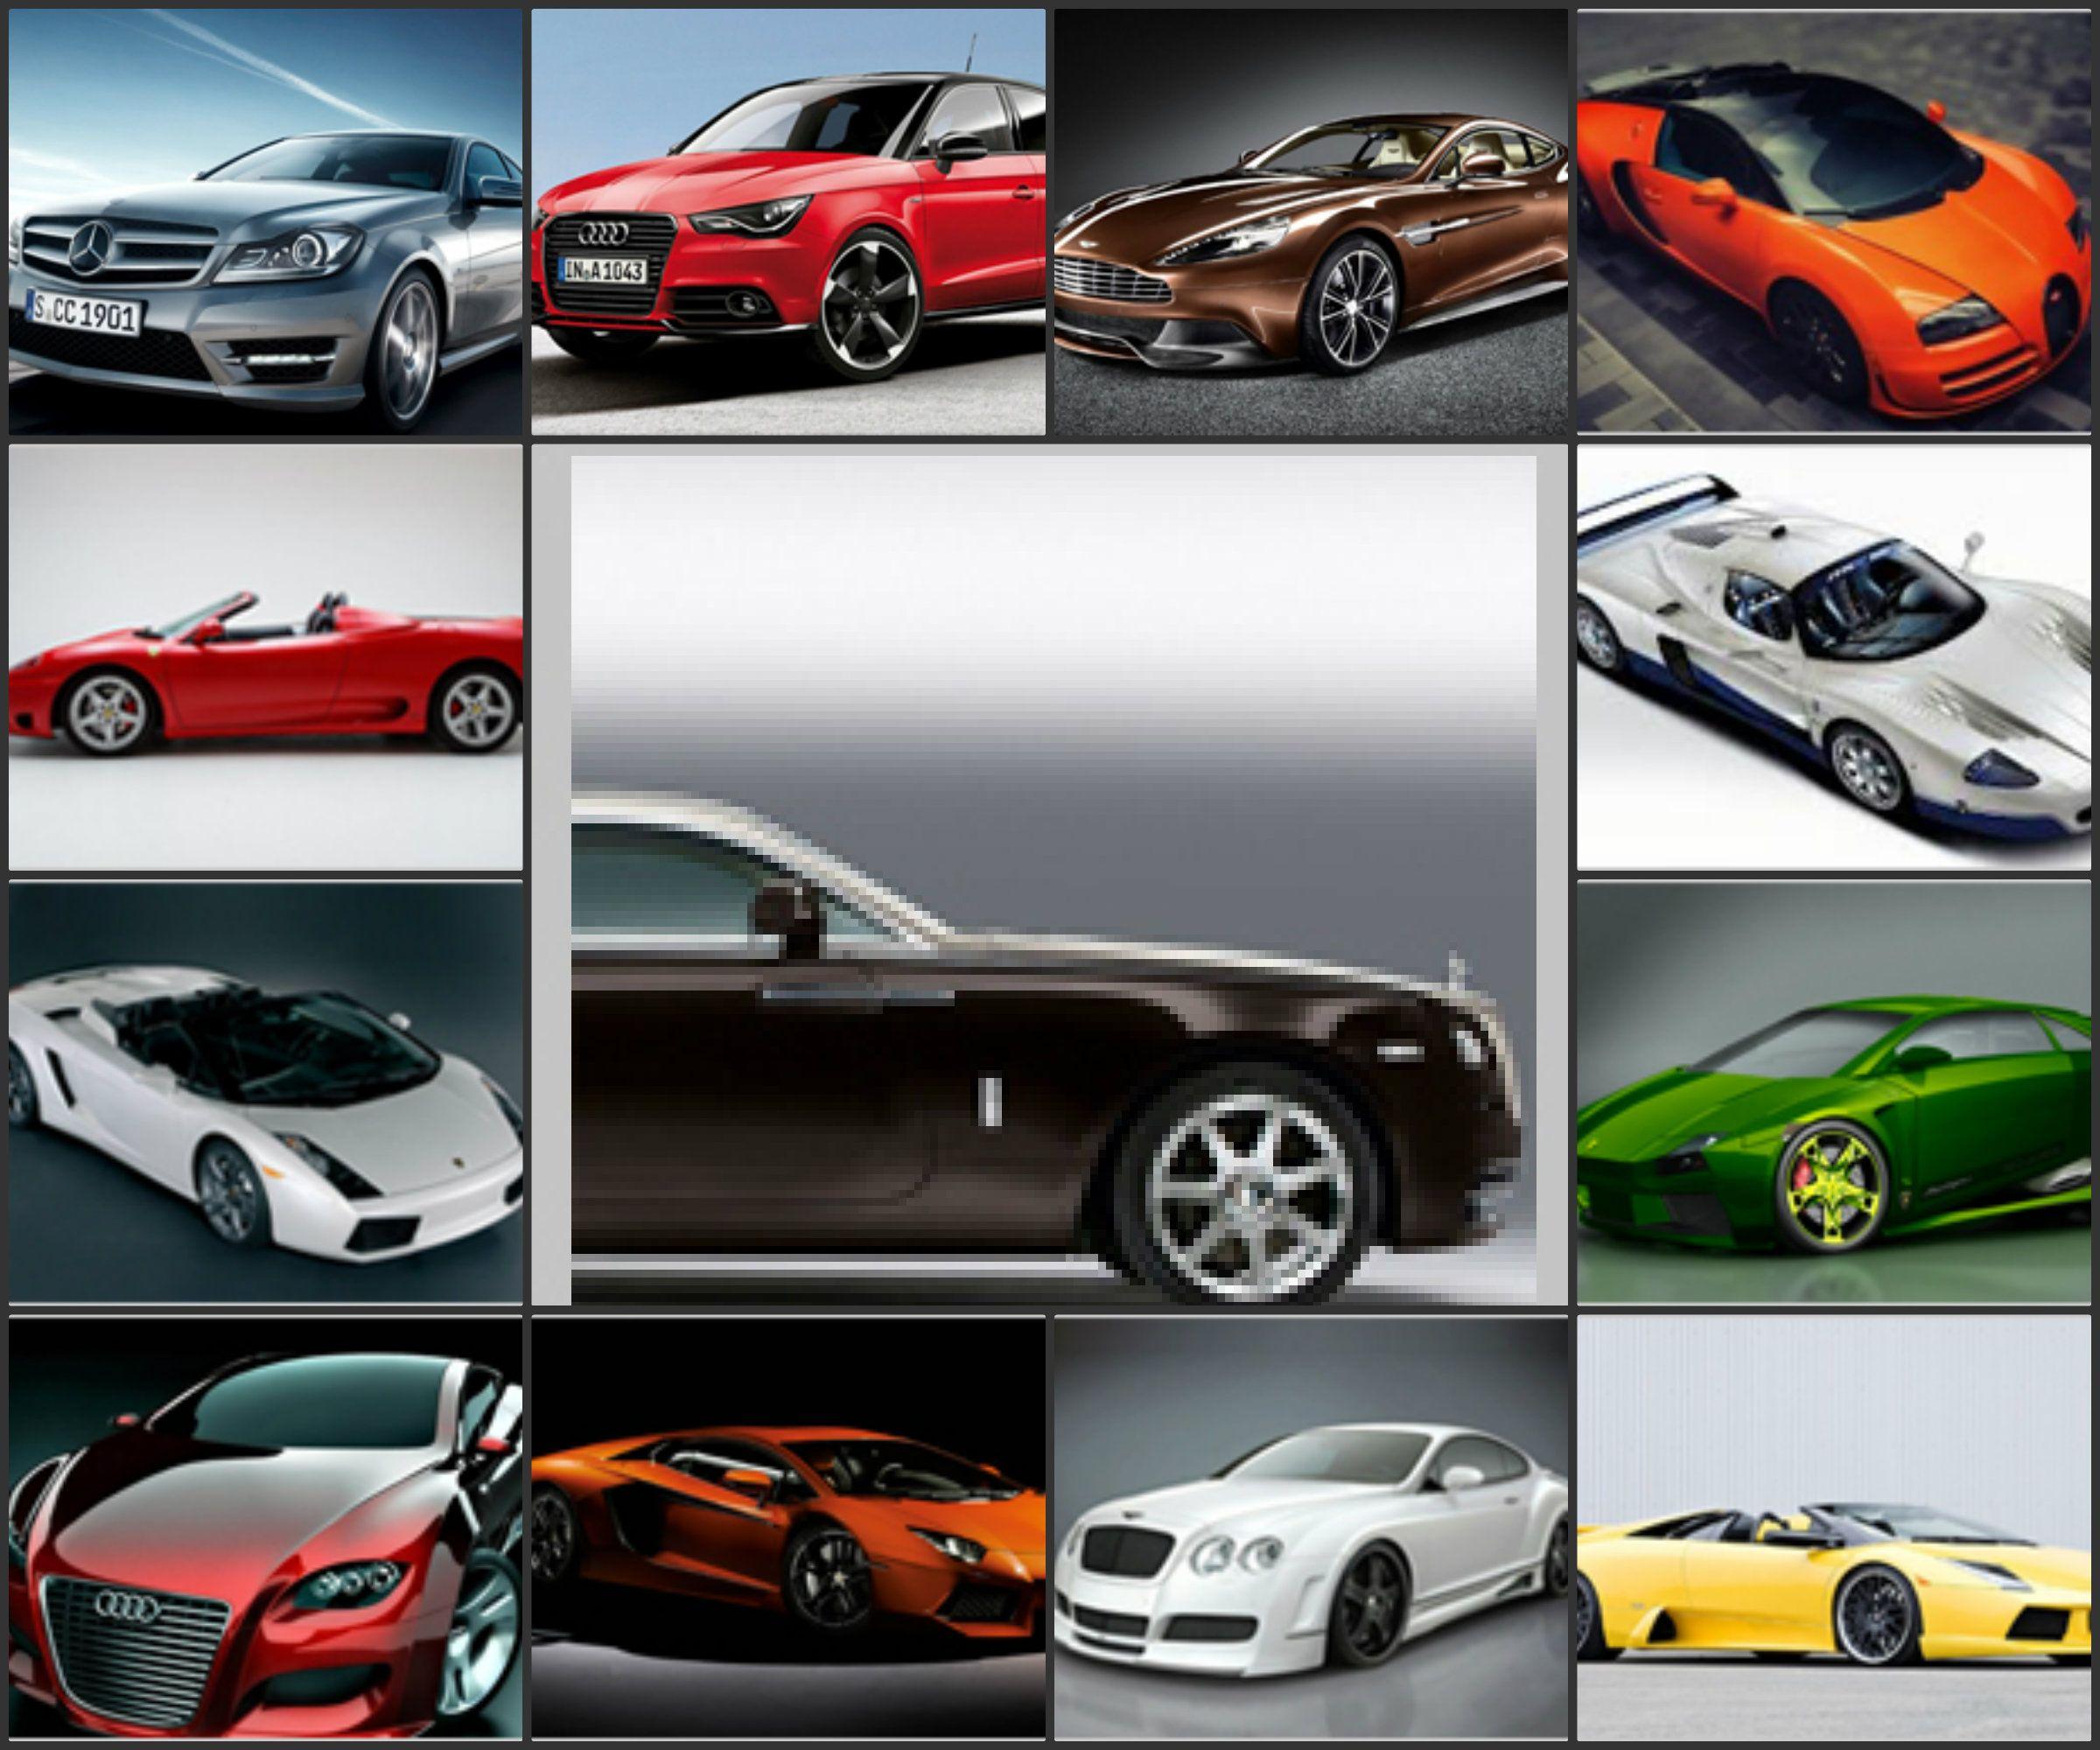 Need A Luxury Car In Dubai For Rental Like Ferraris Porsches Bentleys Bmws Mercedes And More Give Us A Luxury Car Rental Car Rental Luxury Cars